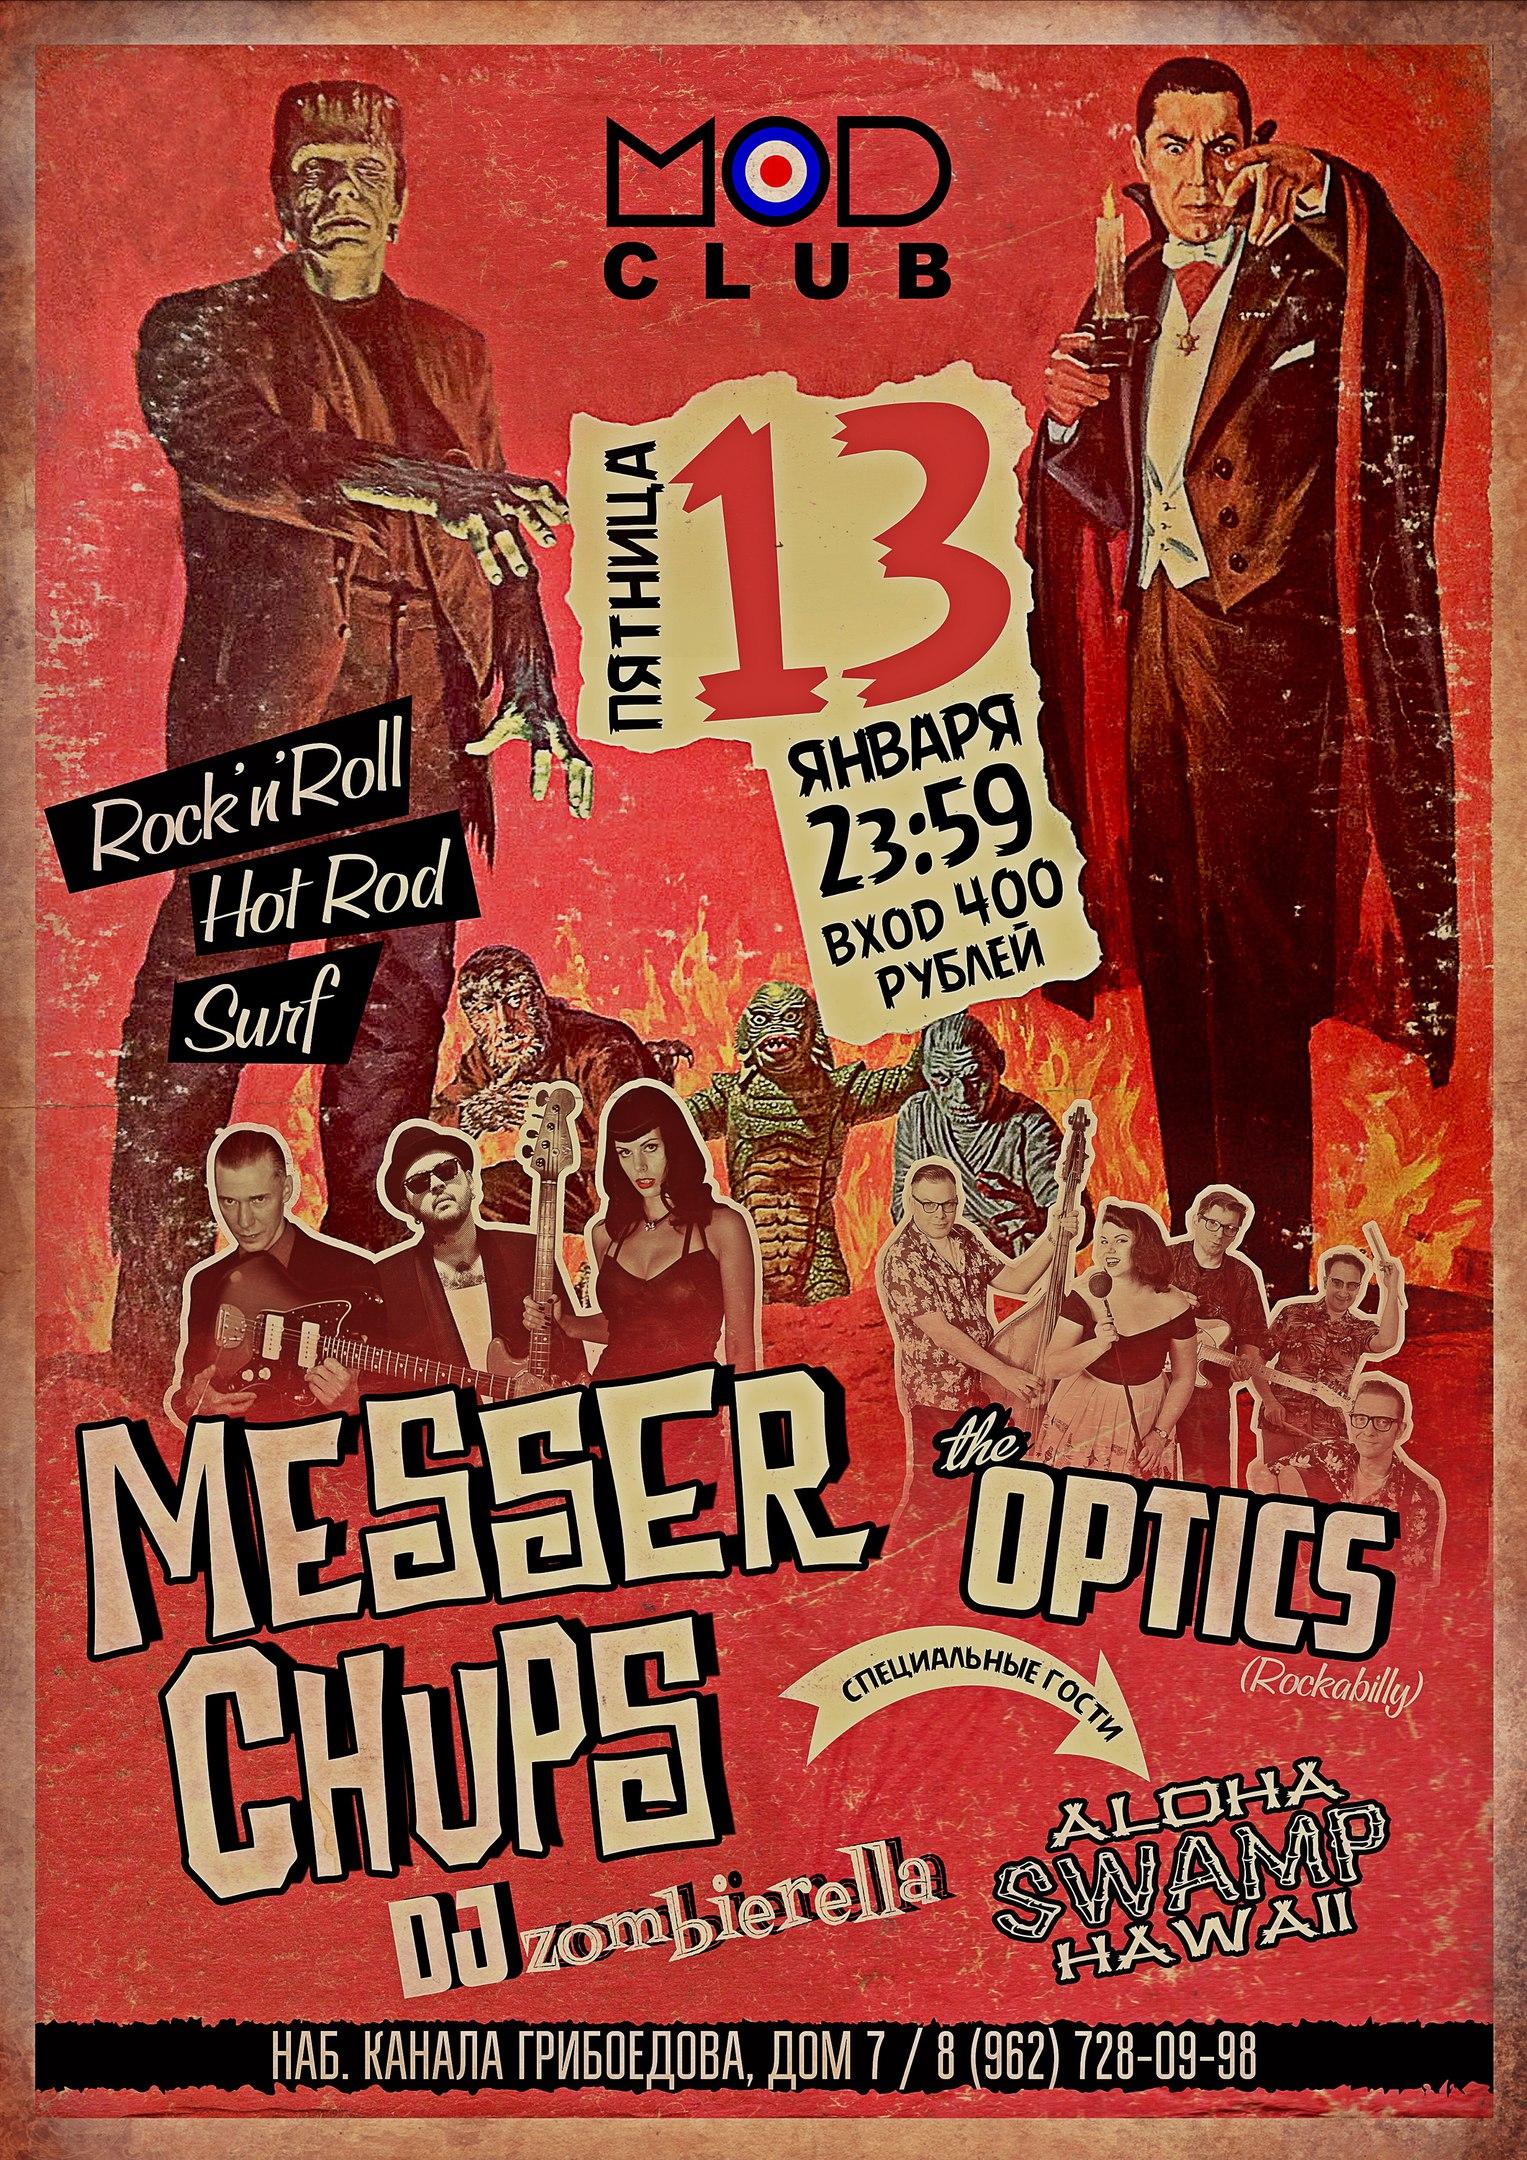 13.01 Messer Chups, The Optics, Aloha Swamp Hawaii в клубе MOD!!!